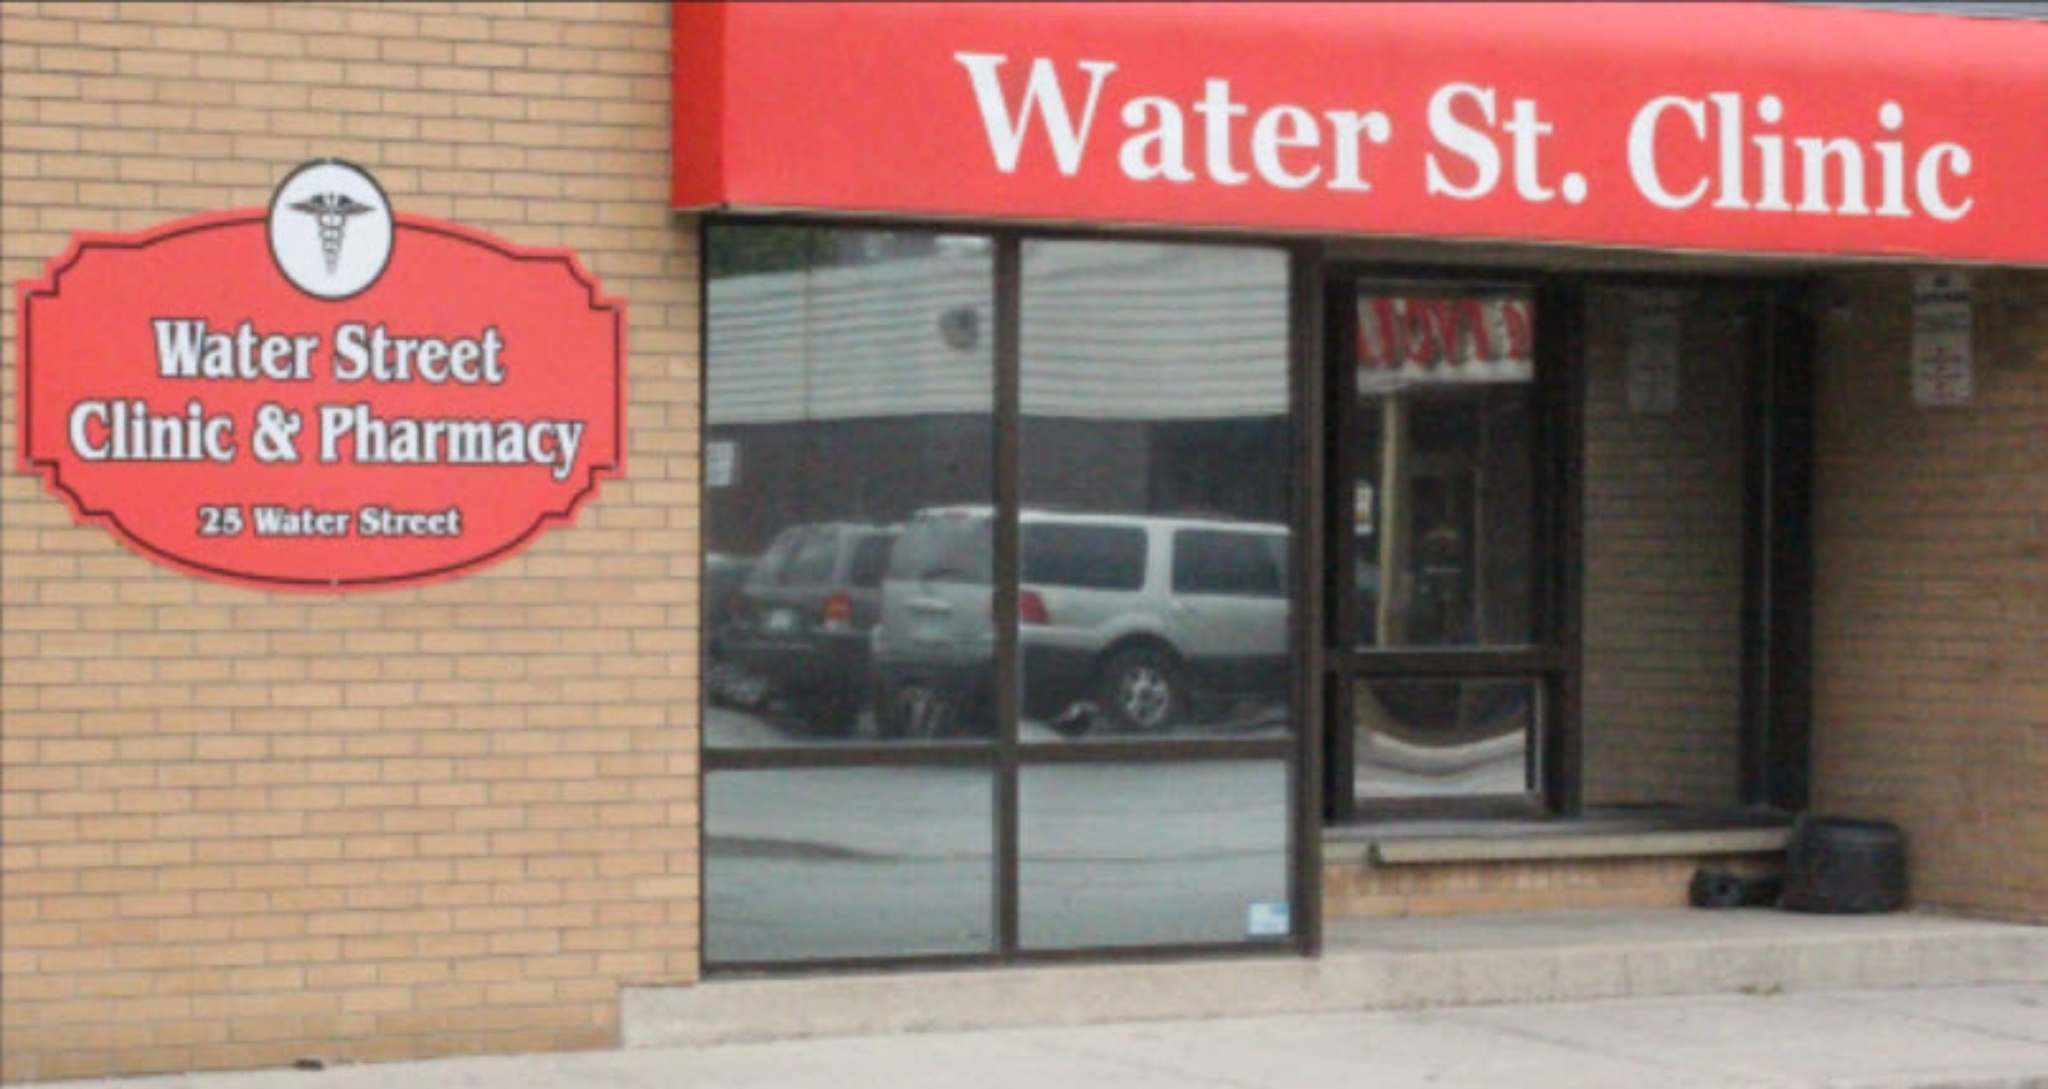 Water Street Clinic & Pharmacy